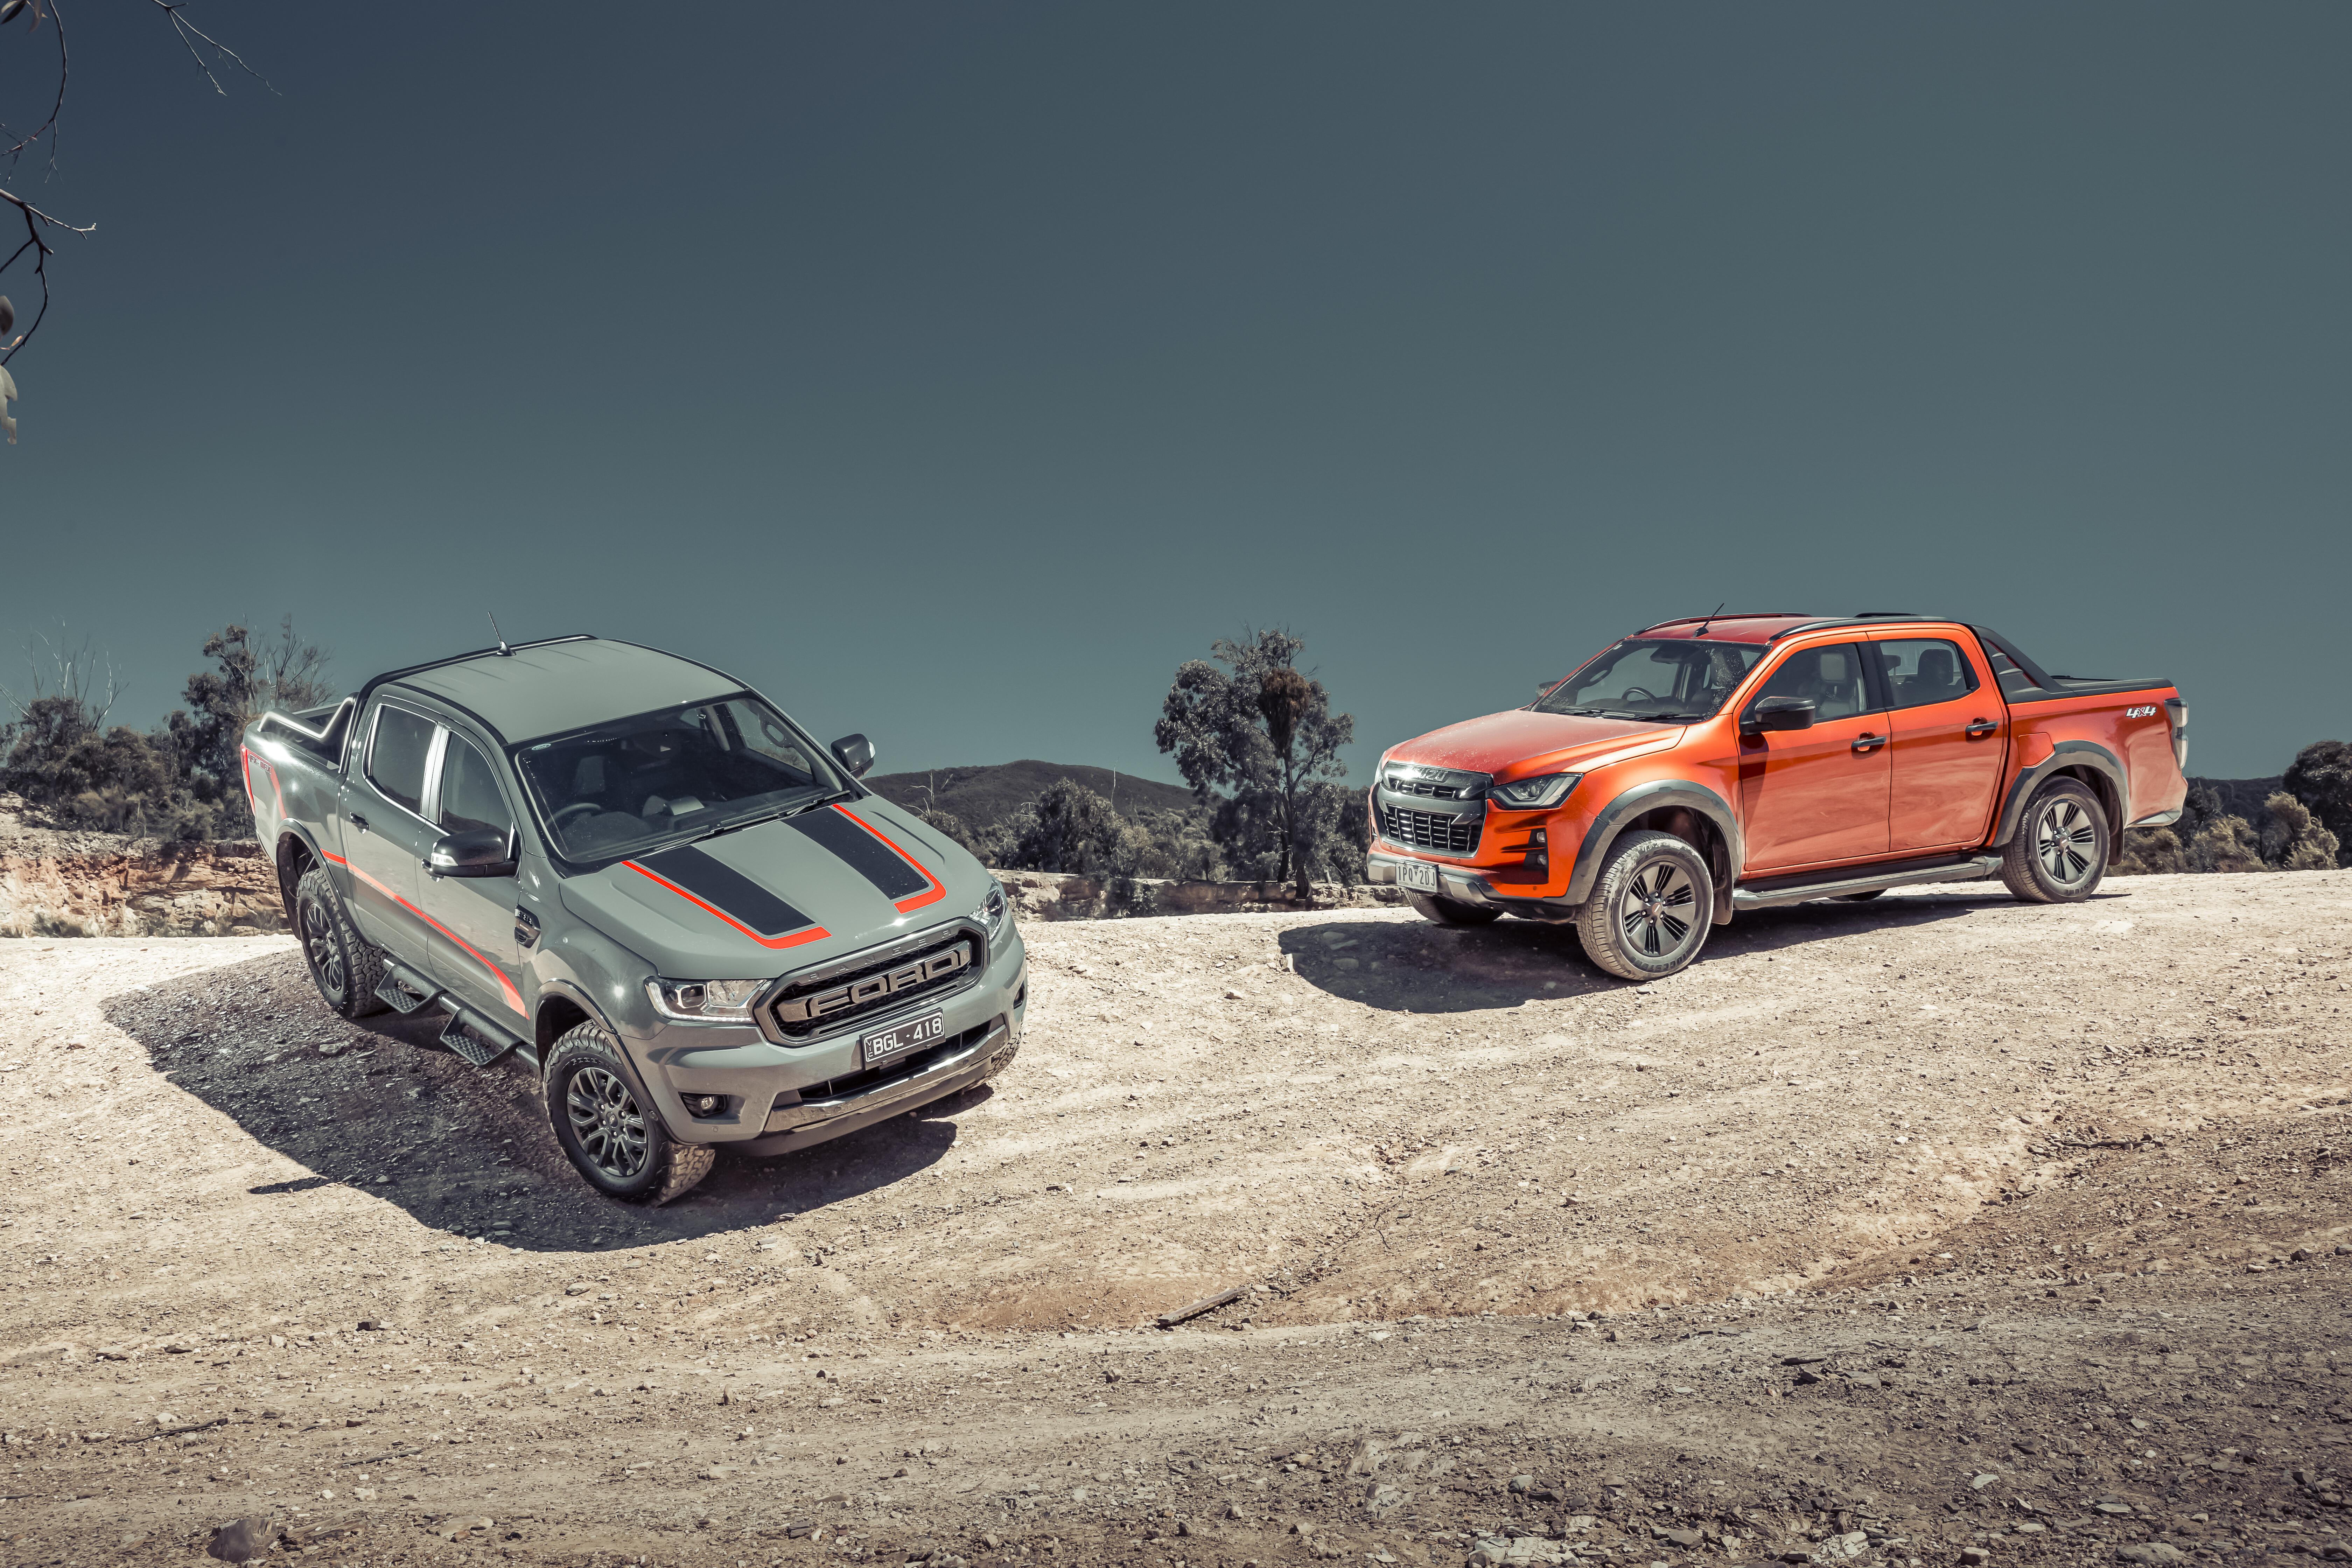 Ford Ranger FX4 MAX versus Isuzu D-MAX X-Terrain